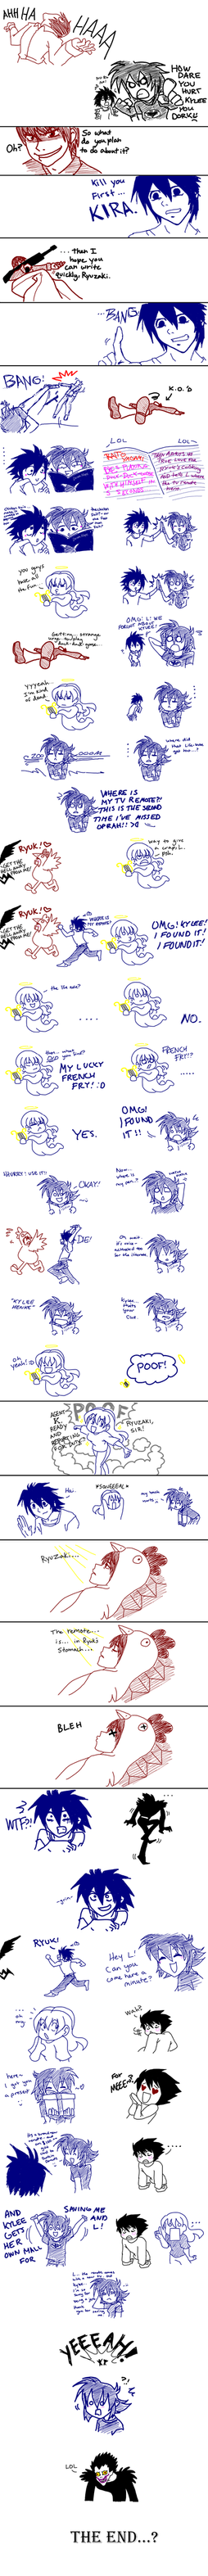 Death Note Shenanigans Pt. 2 by SonicRocksMySocks